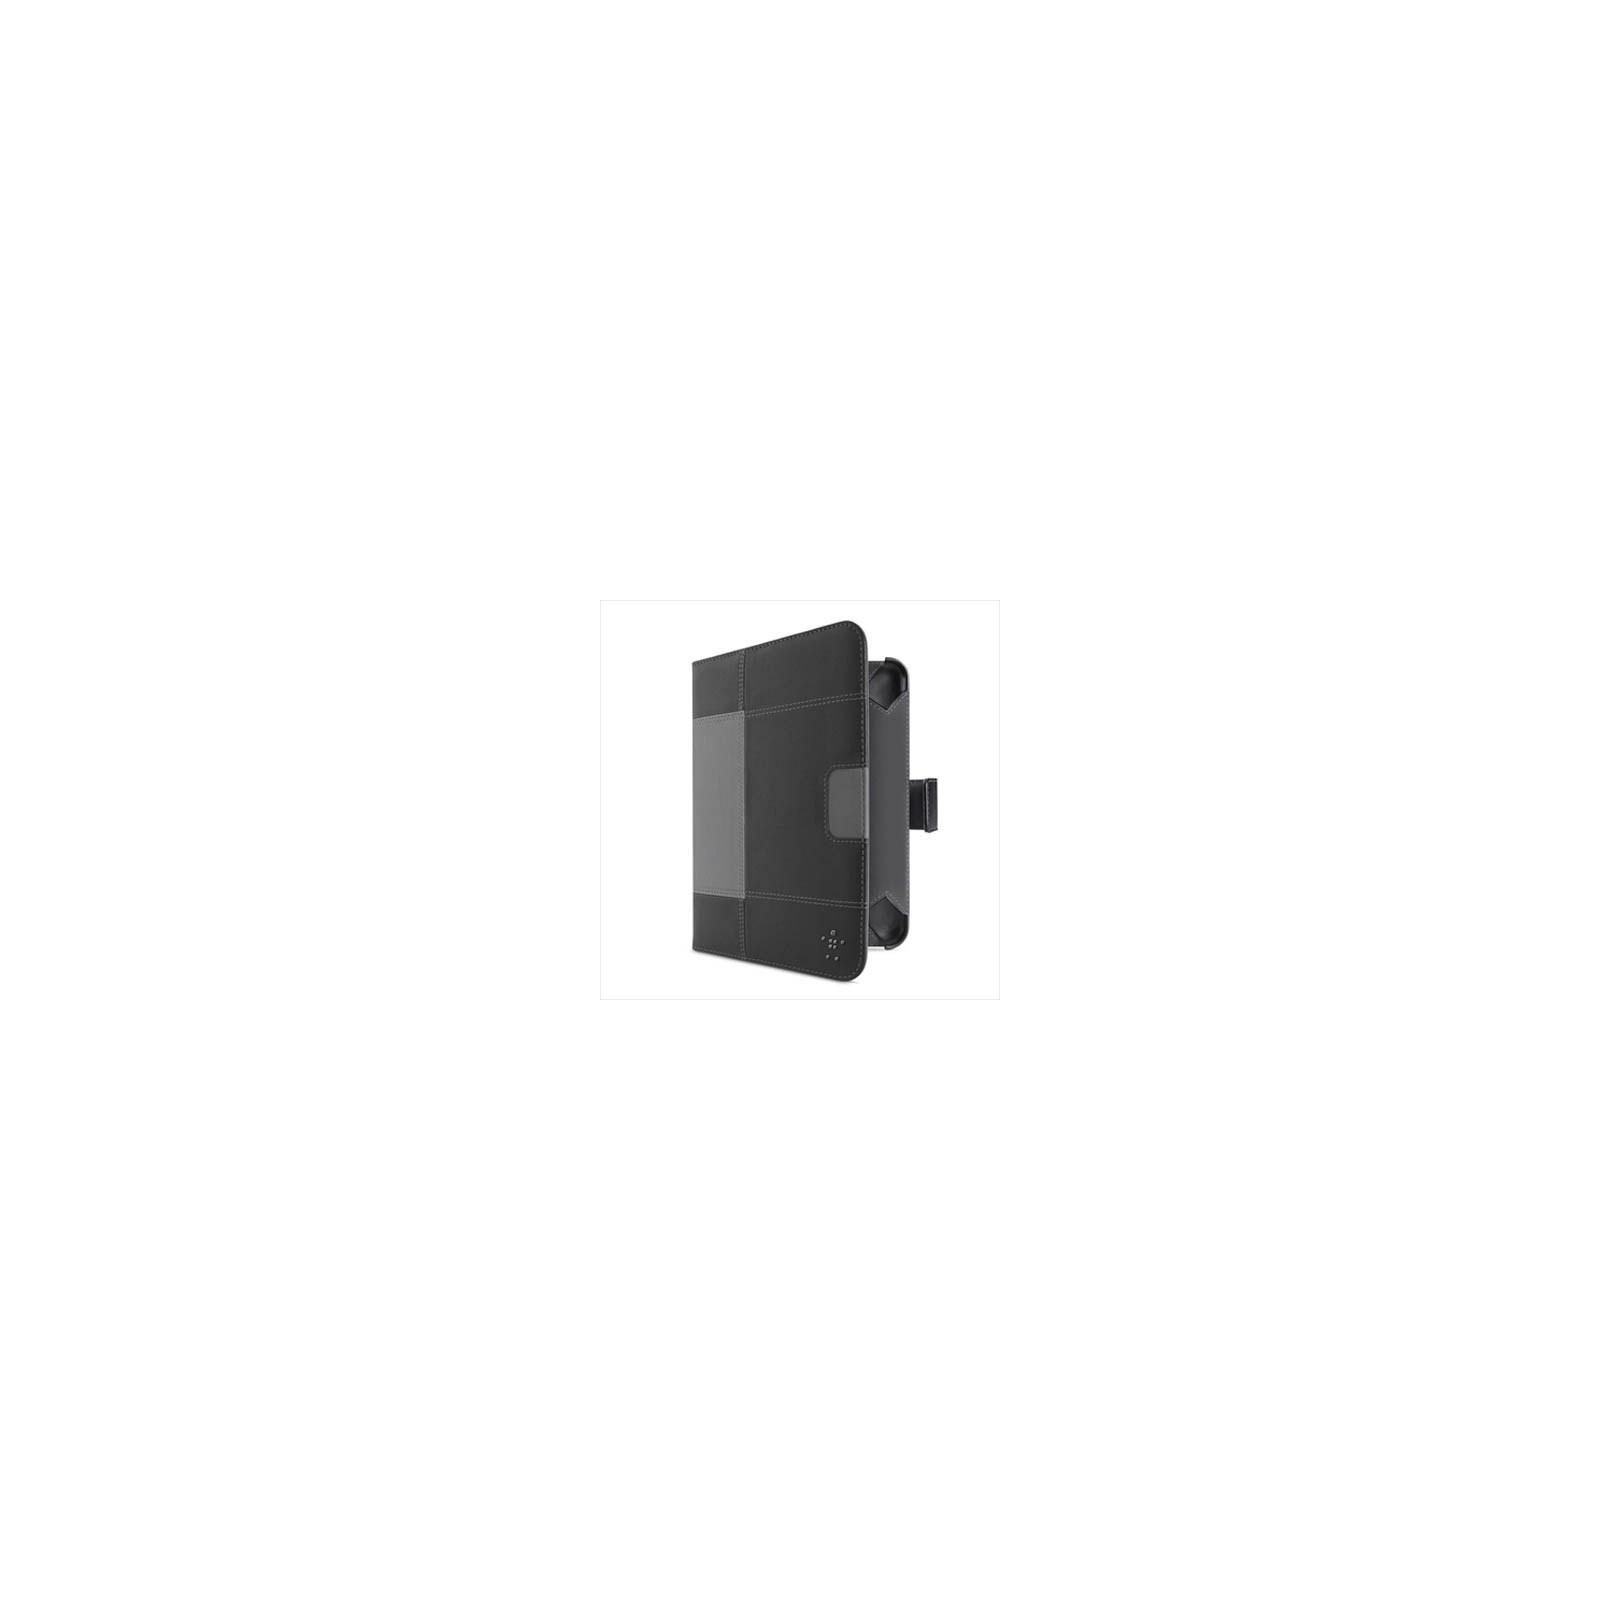 Чехол для планшета Belkin 7 Kindle Fire HD Glam Tab Cover Stand (F8N891vfC00)